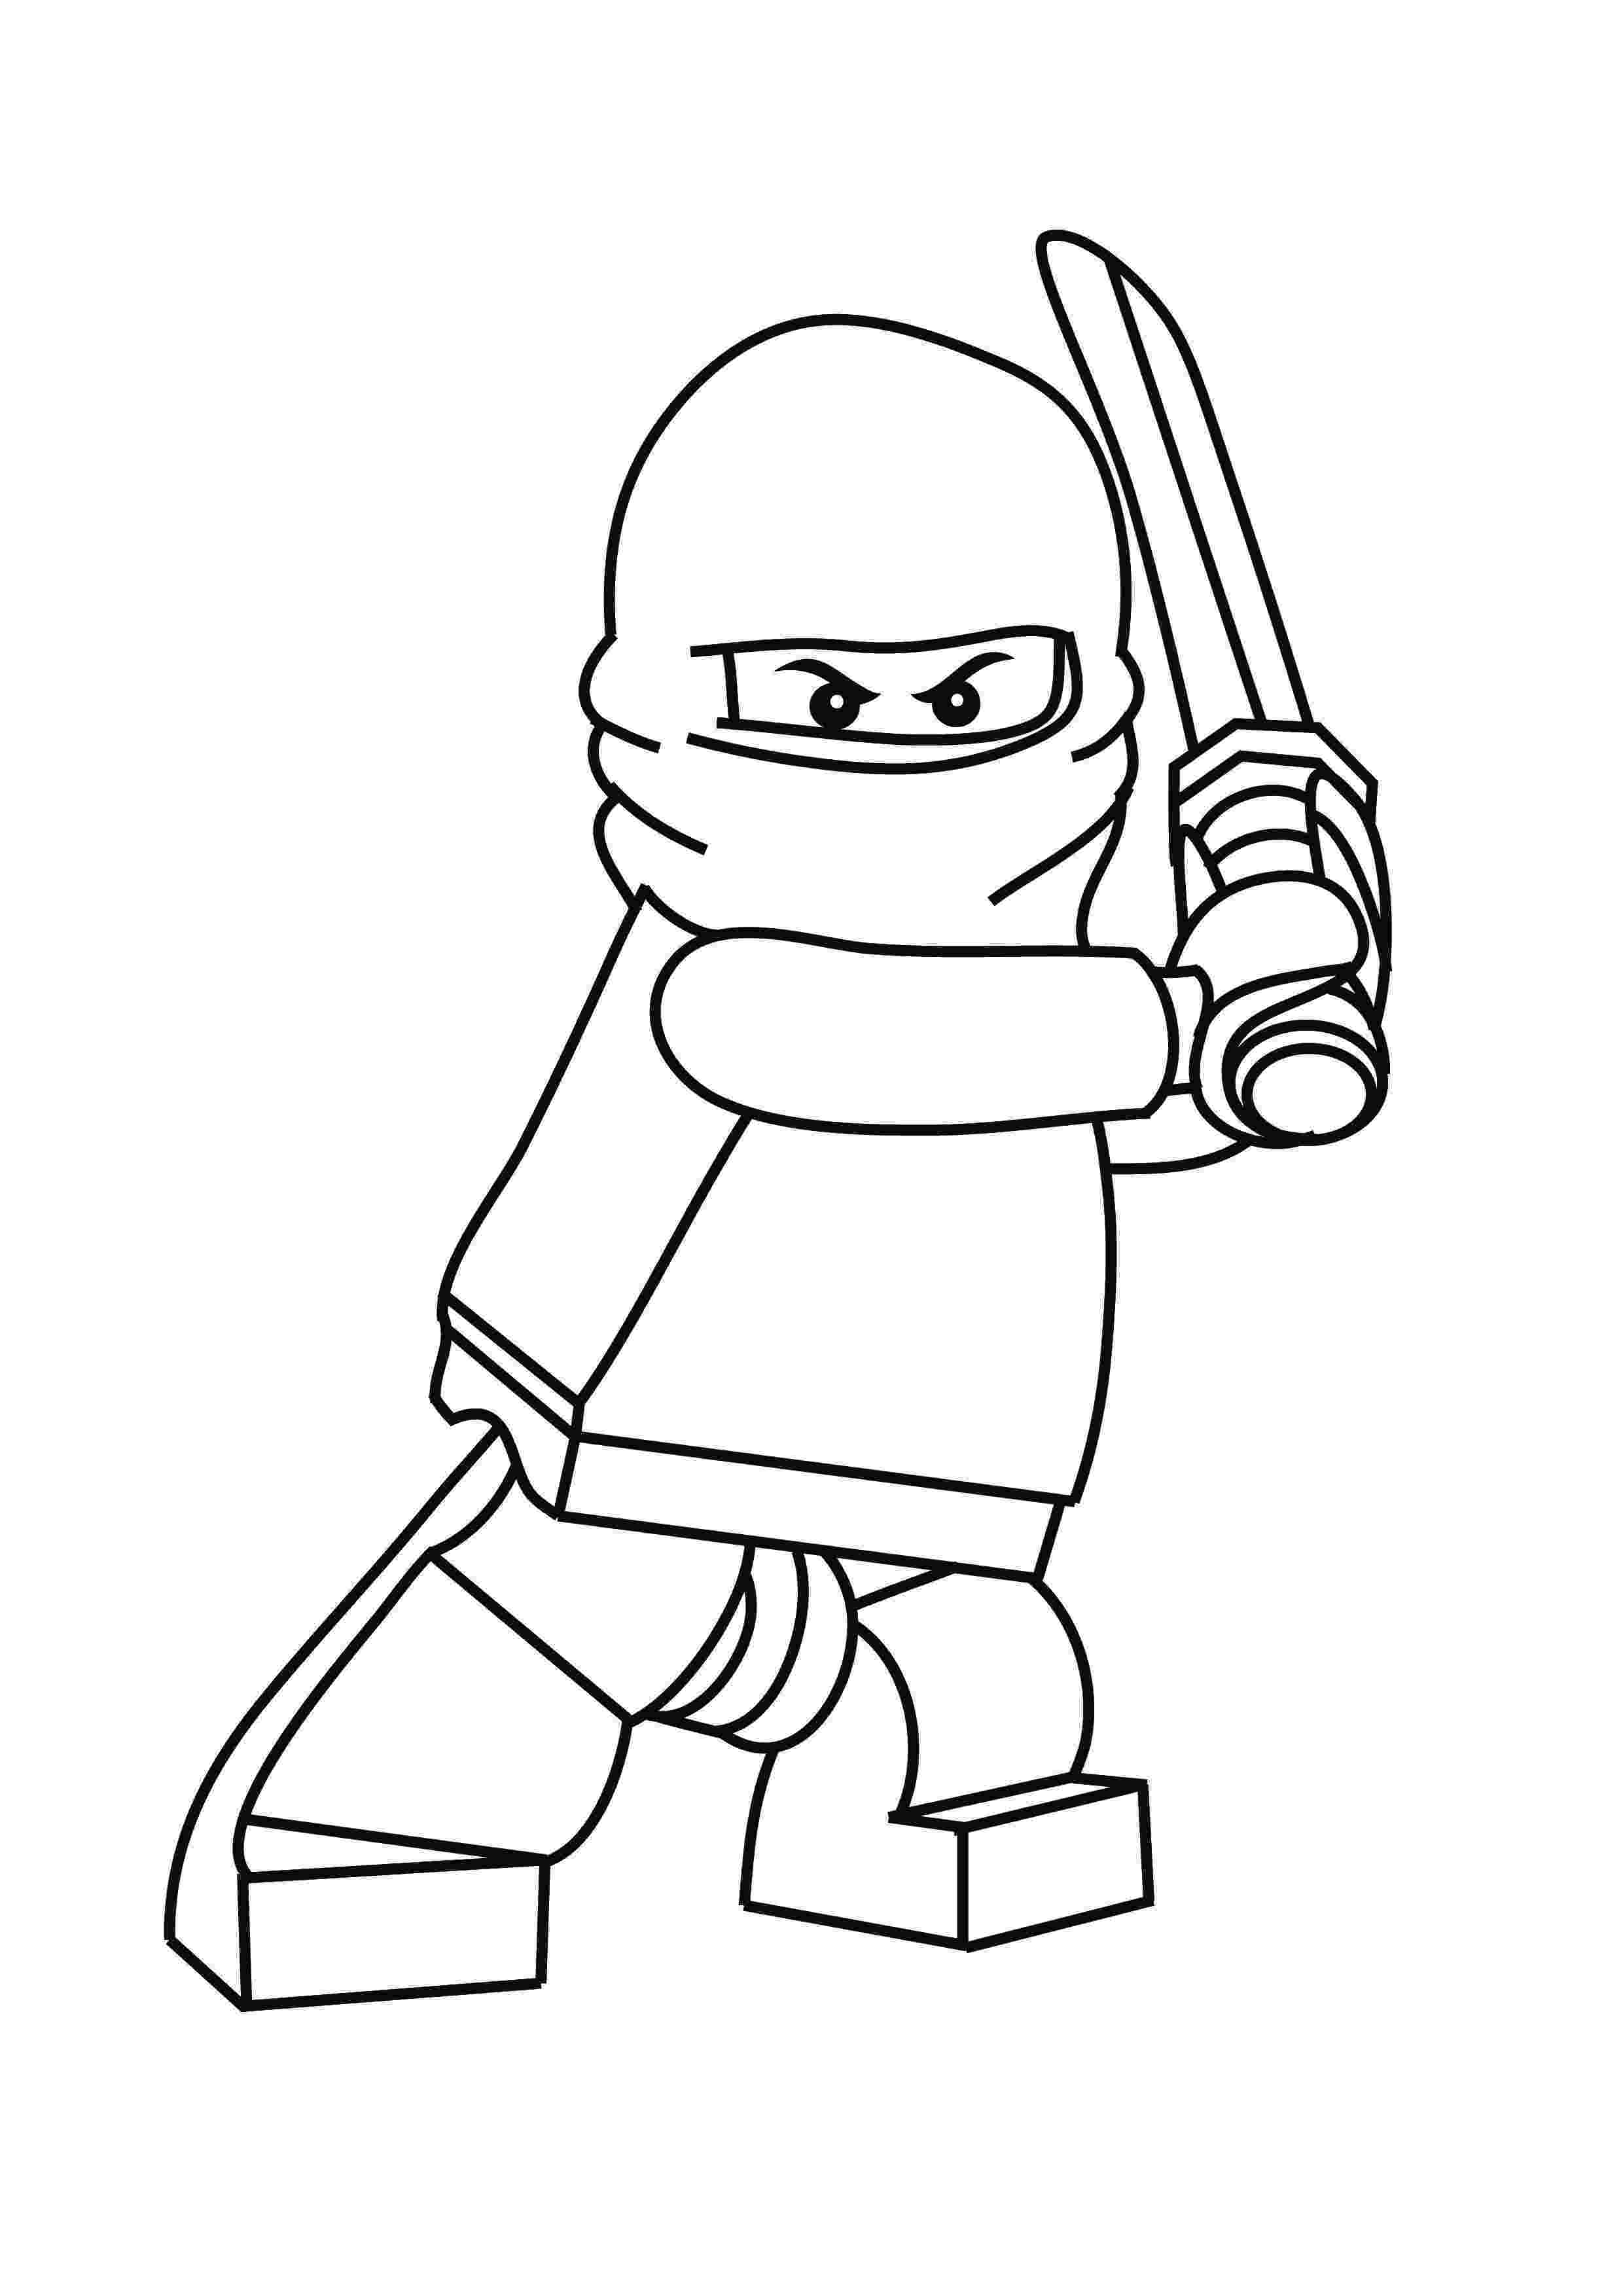 ninjago pictures to print free printable ninjago coloring pages for kids arts and to ninjago pictures print